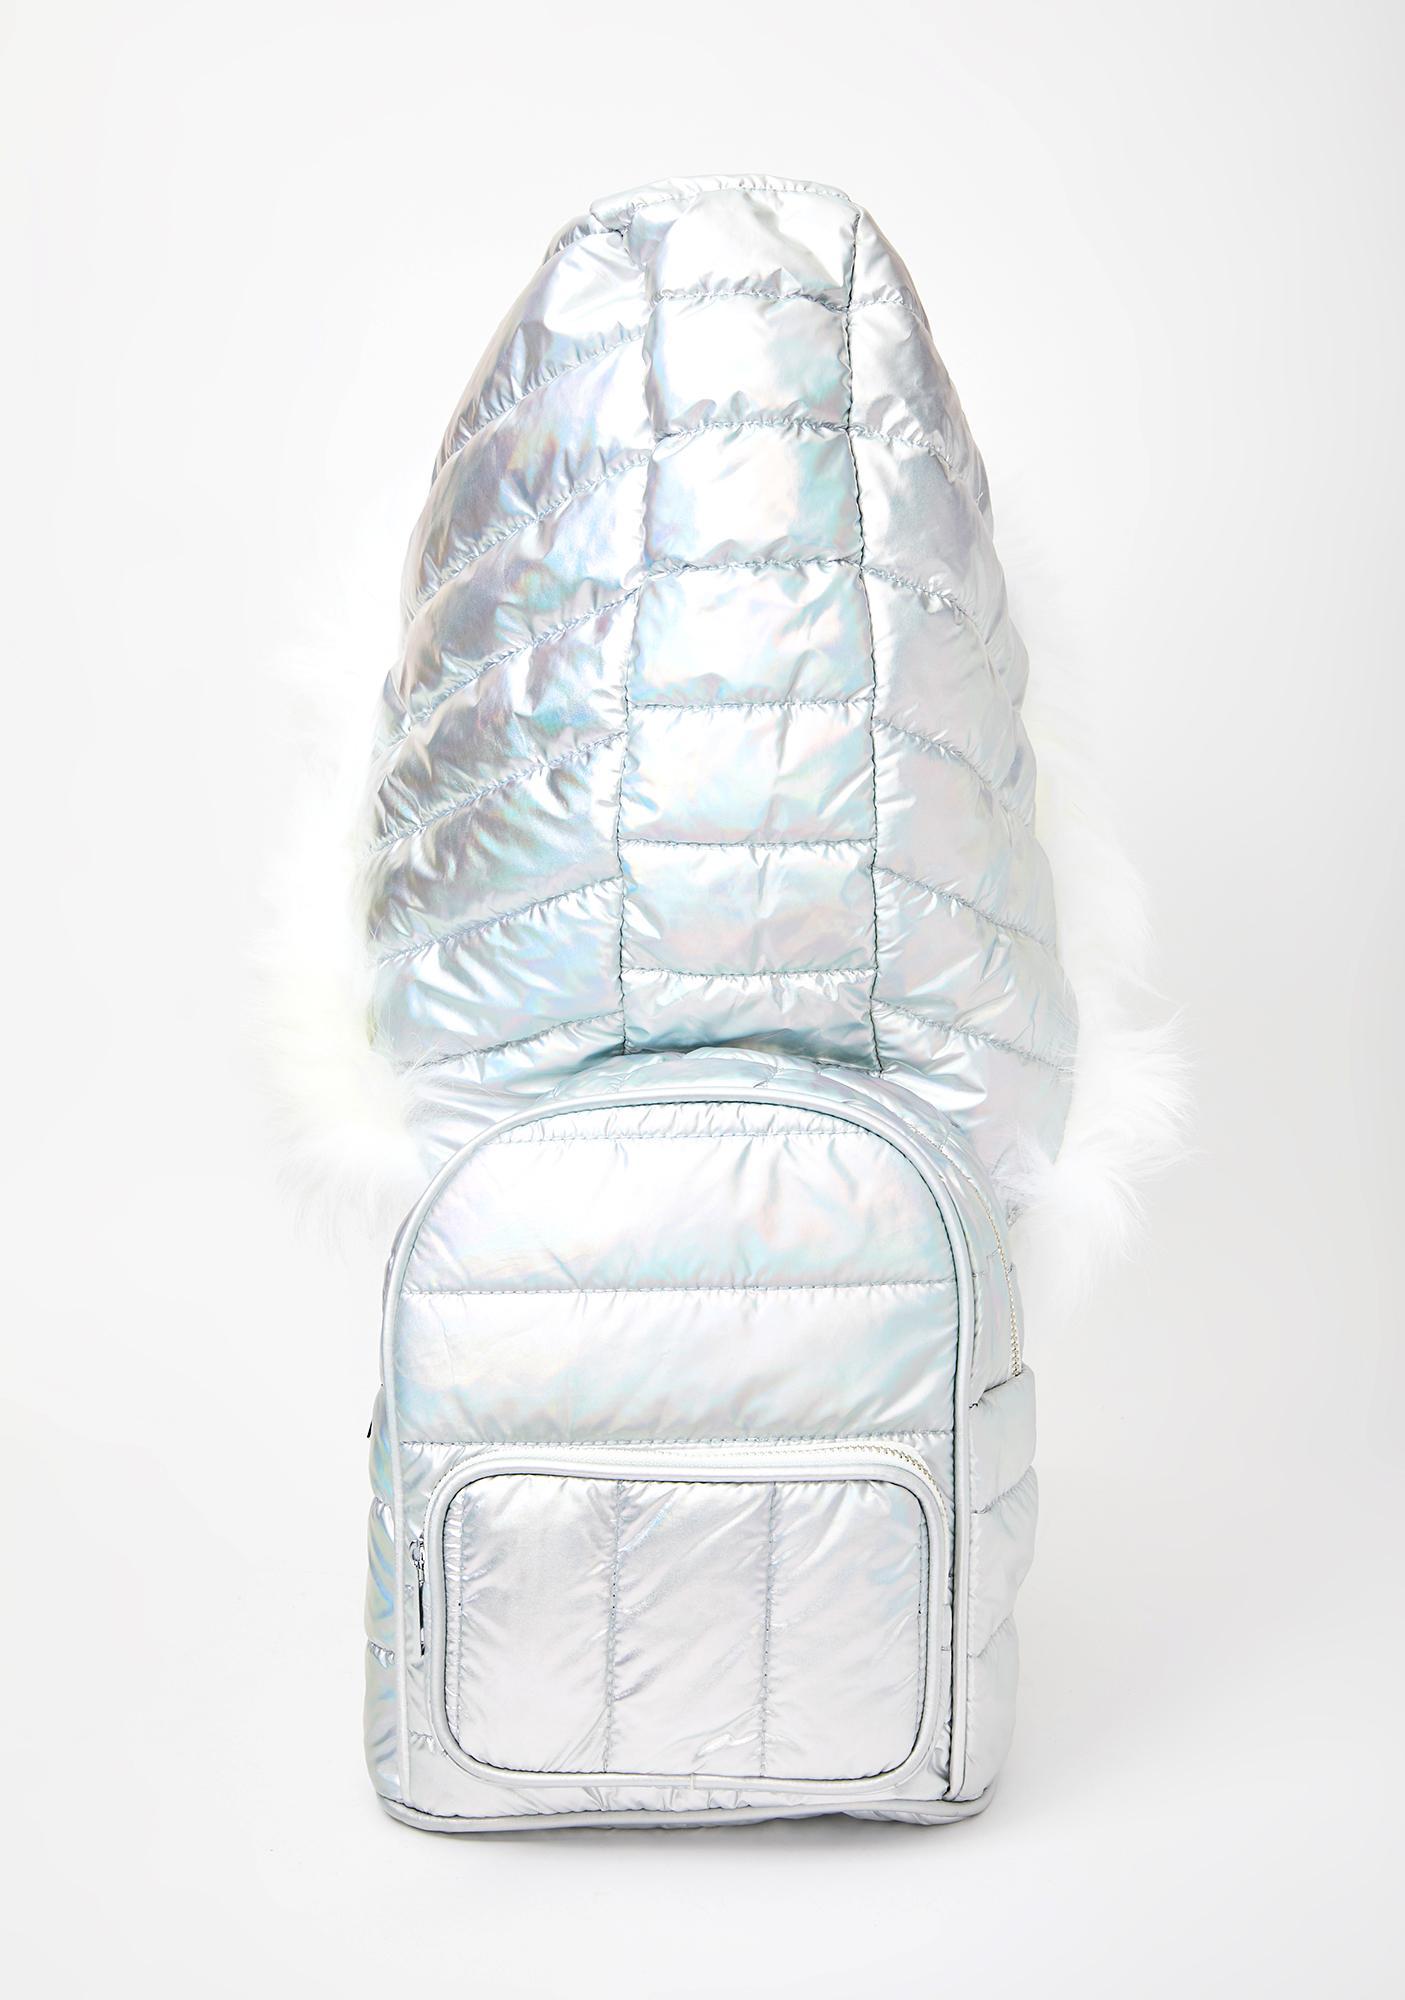 Club Exx Aspen Extreme Hoodie Backpack